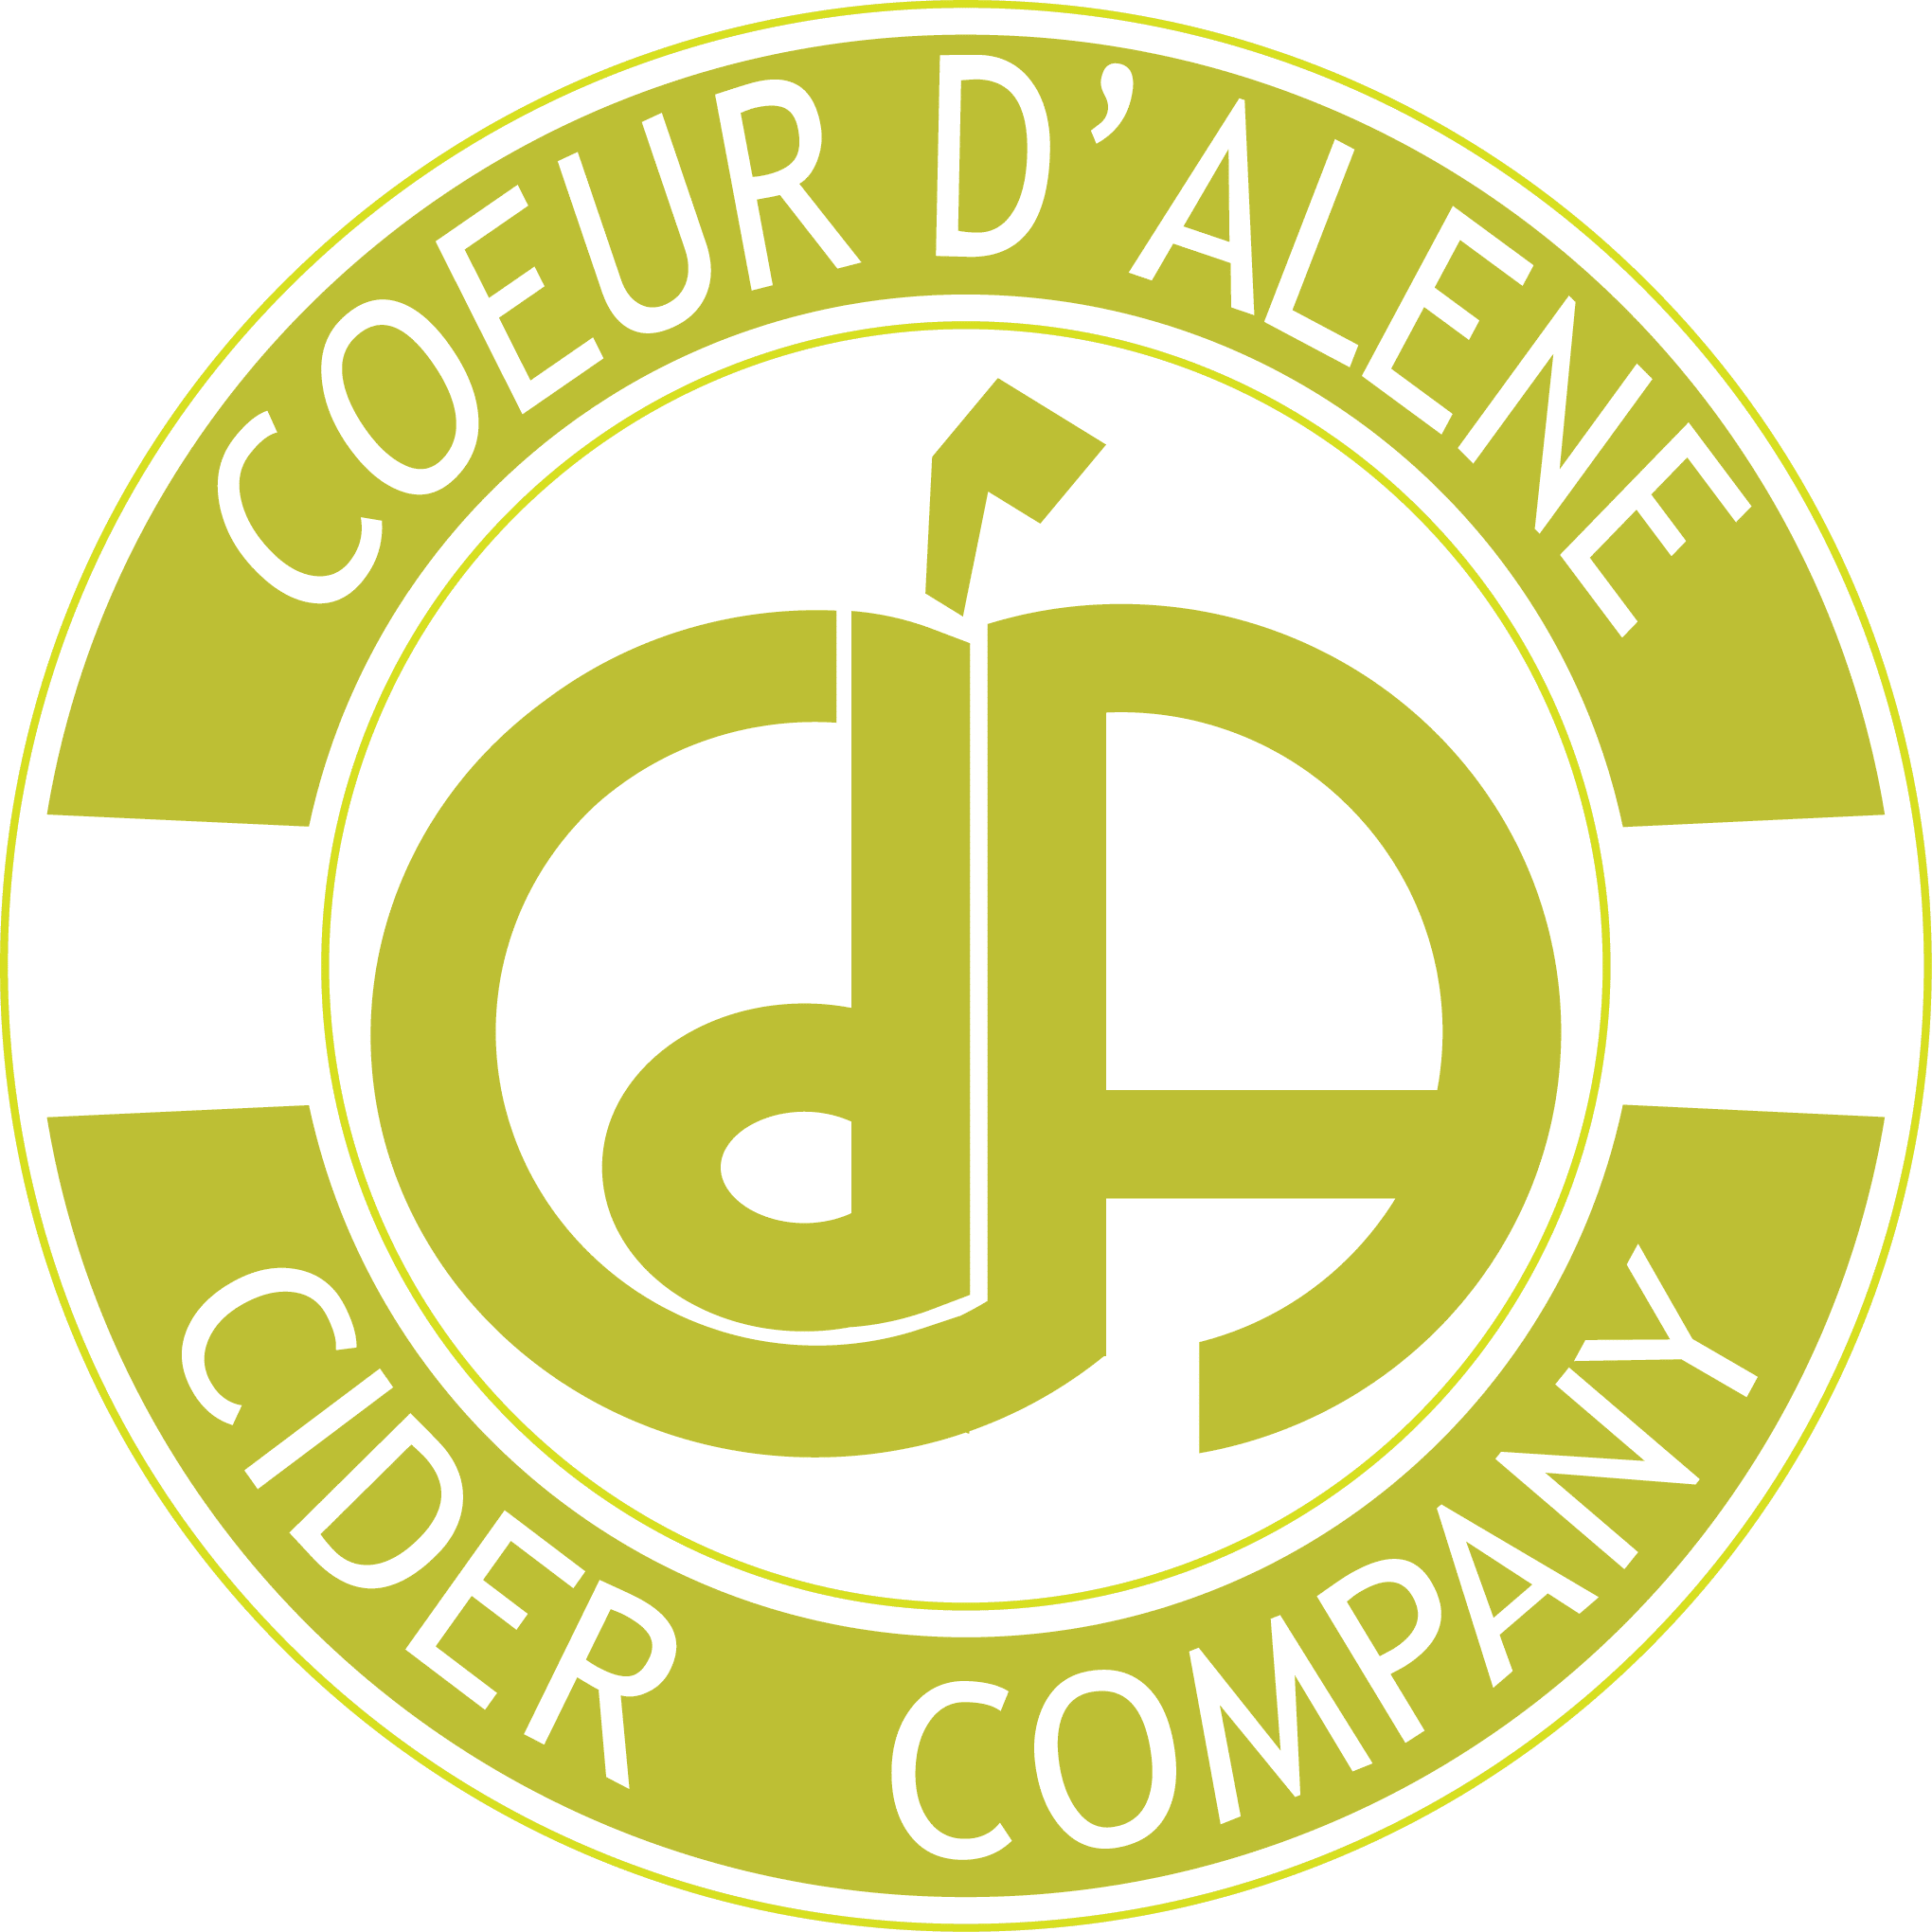 Coeur d'Alene Cider Company